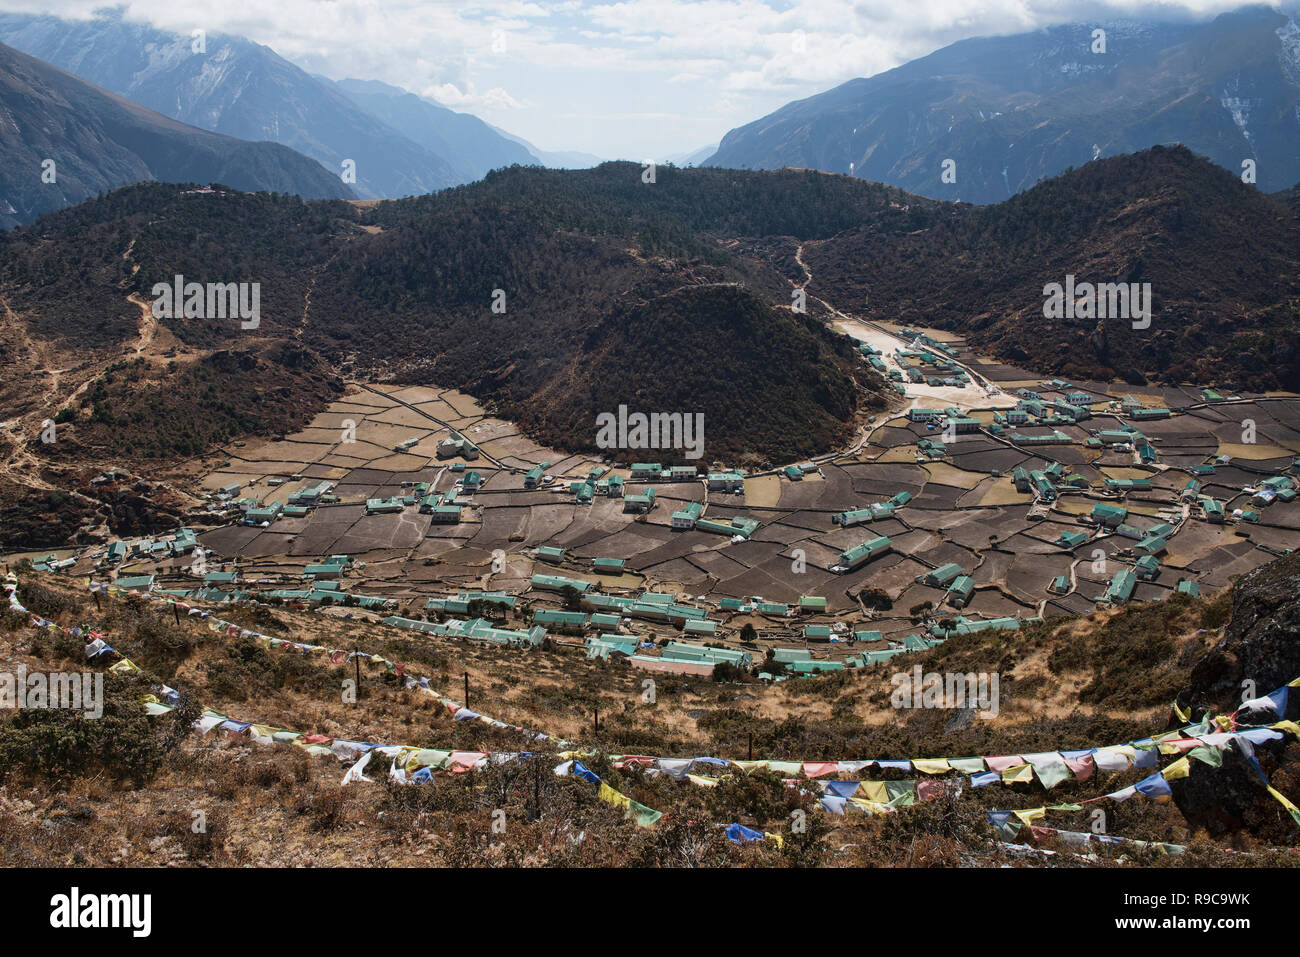 The Sherpa village of Khumjung, Everest region, Khumbu, Nepal - Stock Image